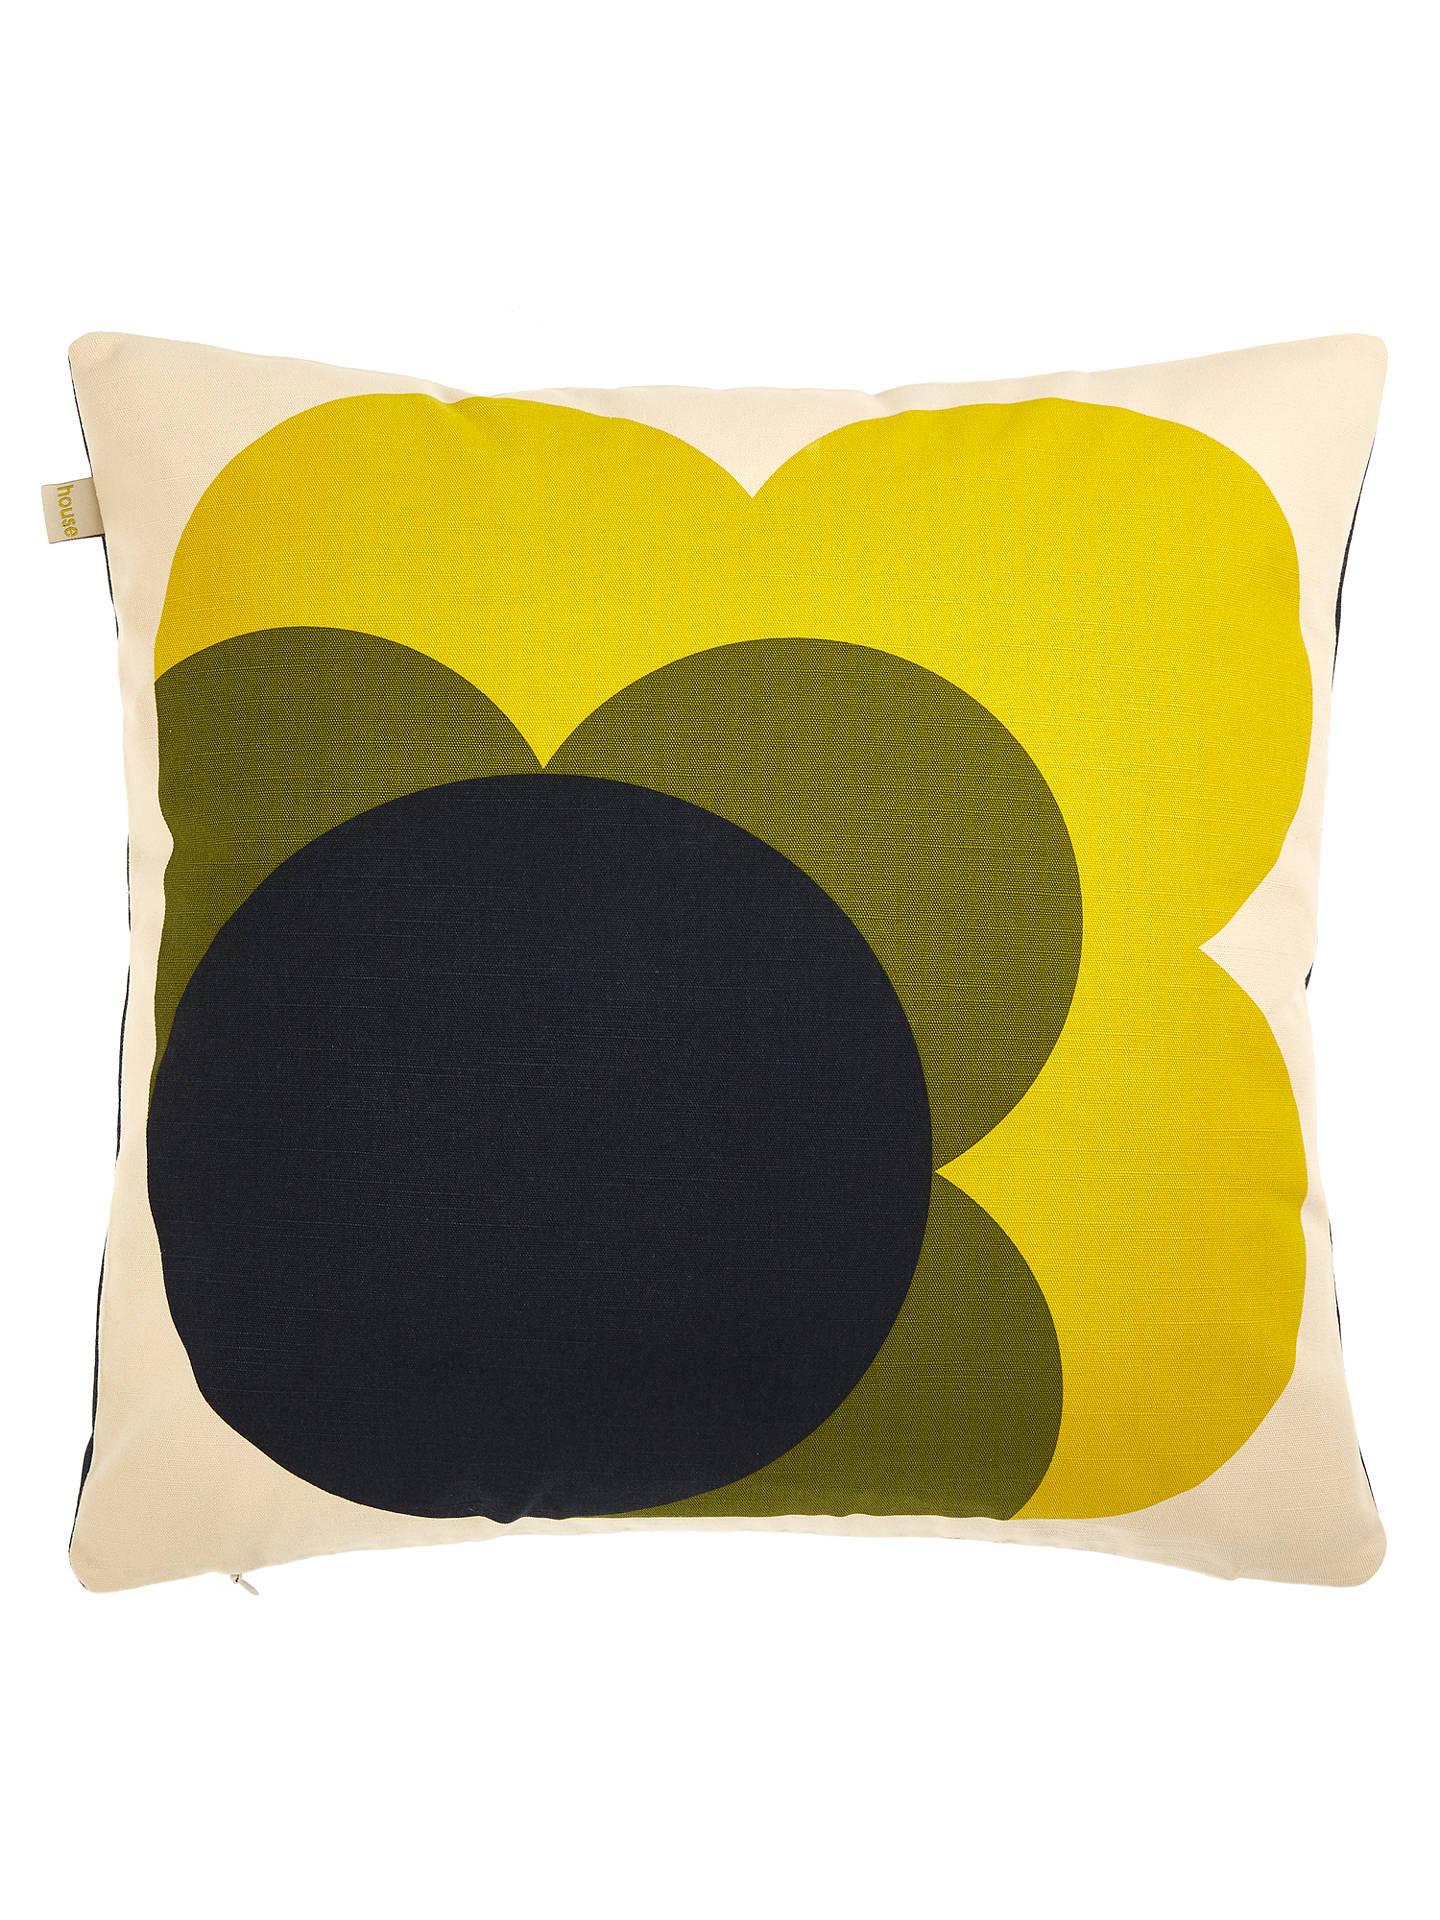 Bigspot Com Reviews >> Orla Kiely Single Bigspot Flower Reversible Cushion at John Lewis & Partners